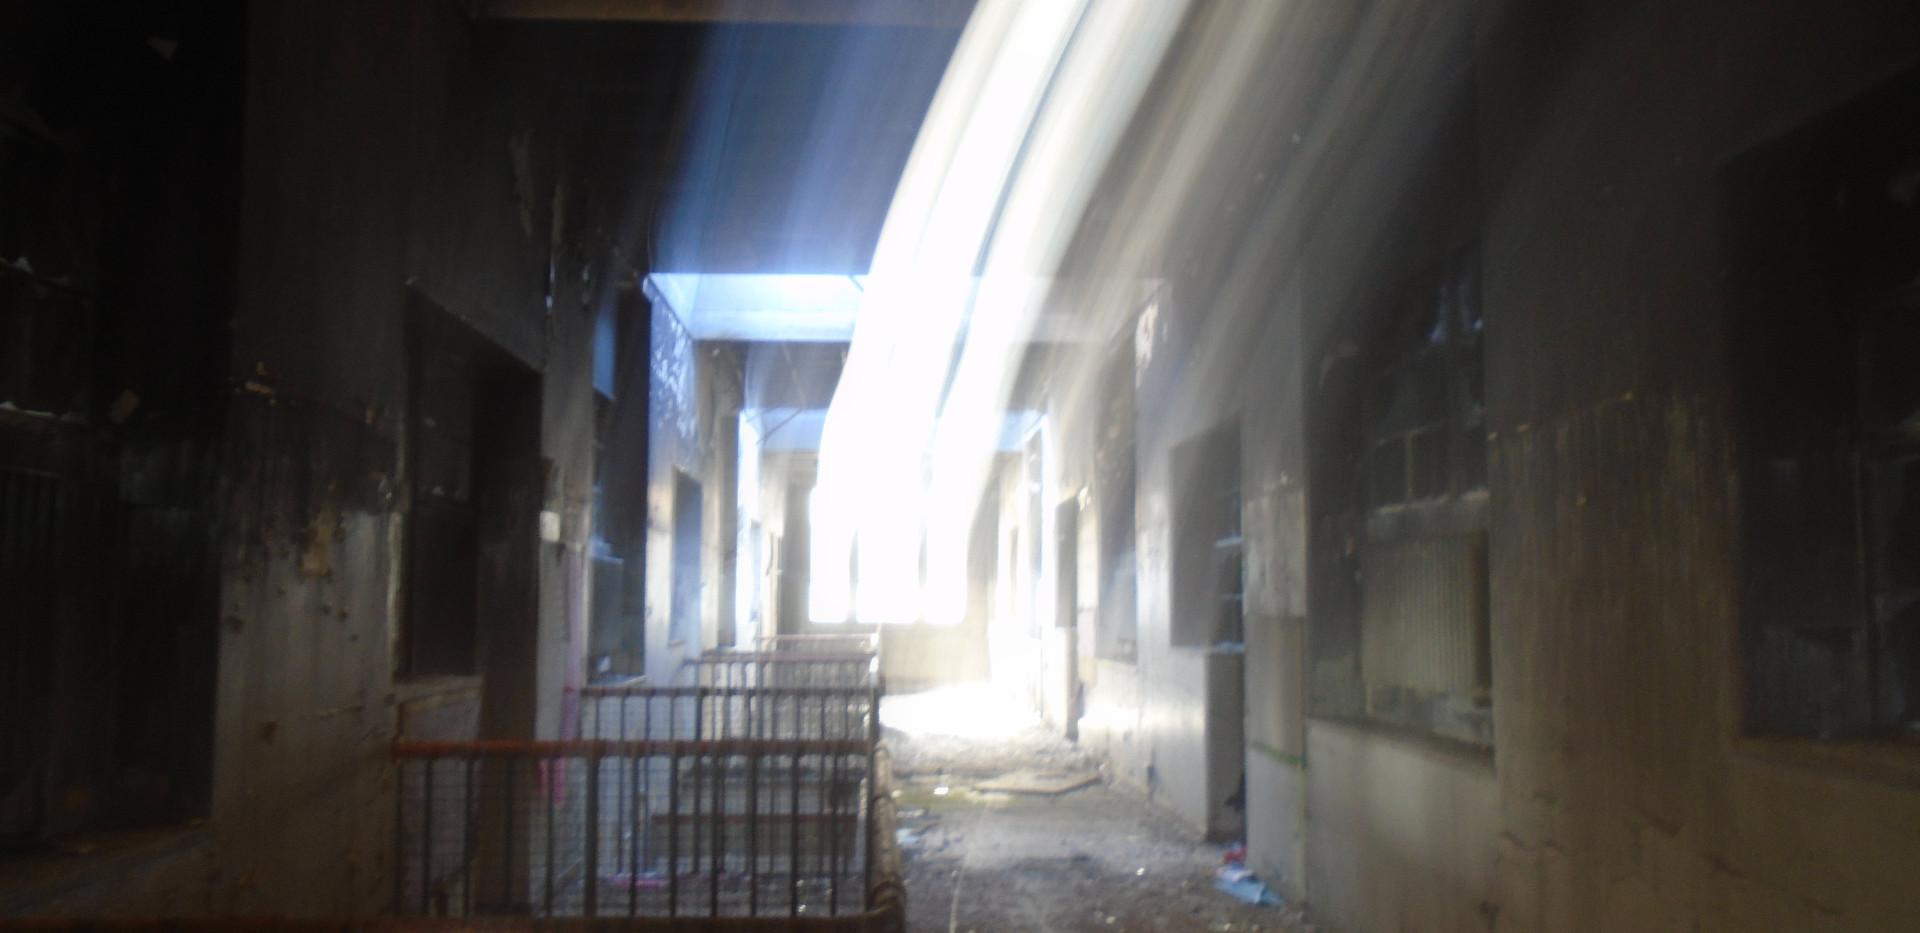 Interior of the buildings, Victoria Road School, Torry